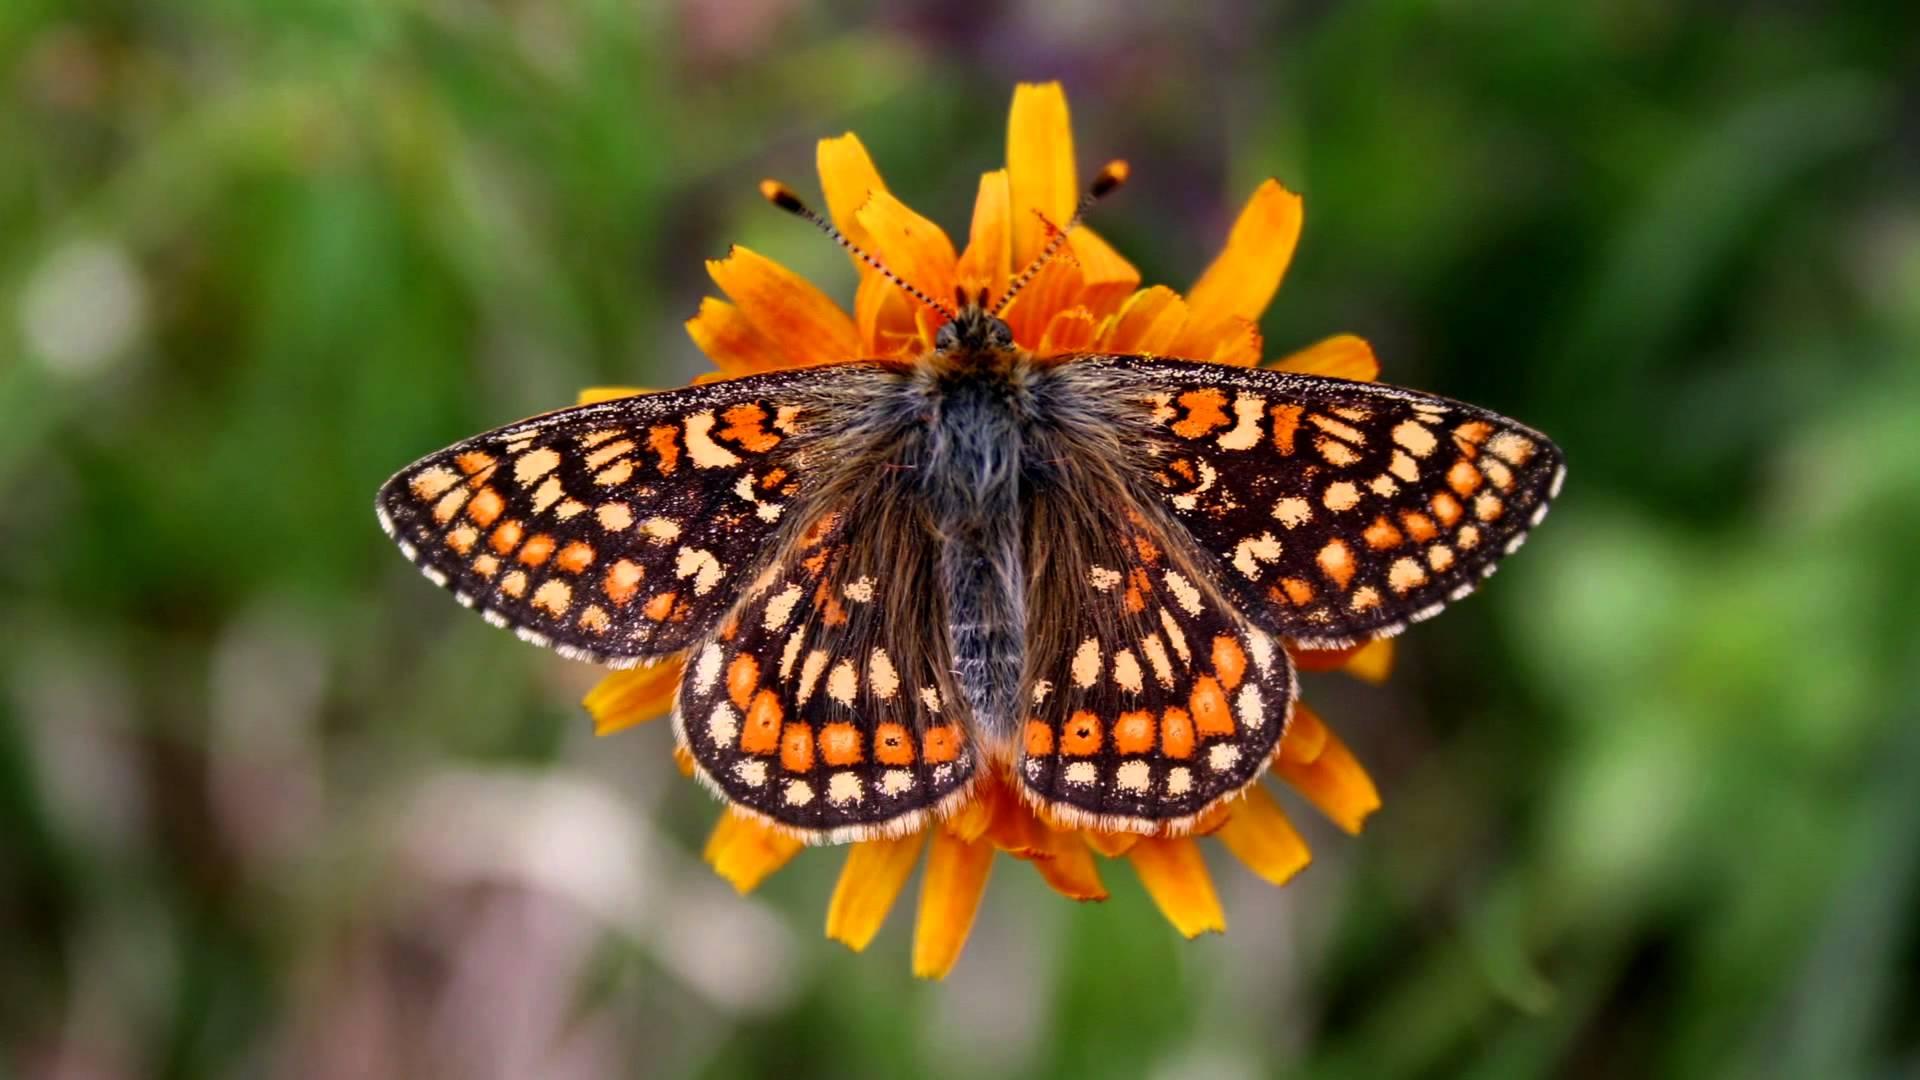 Pillole di natura: Mille e mille farfalle